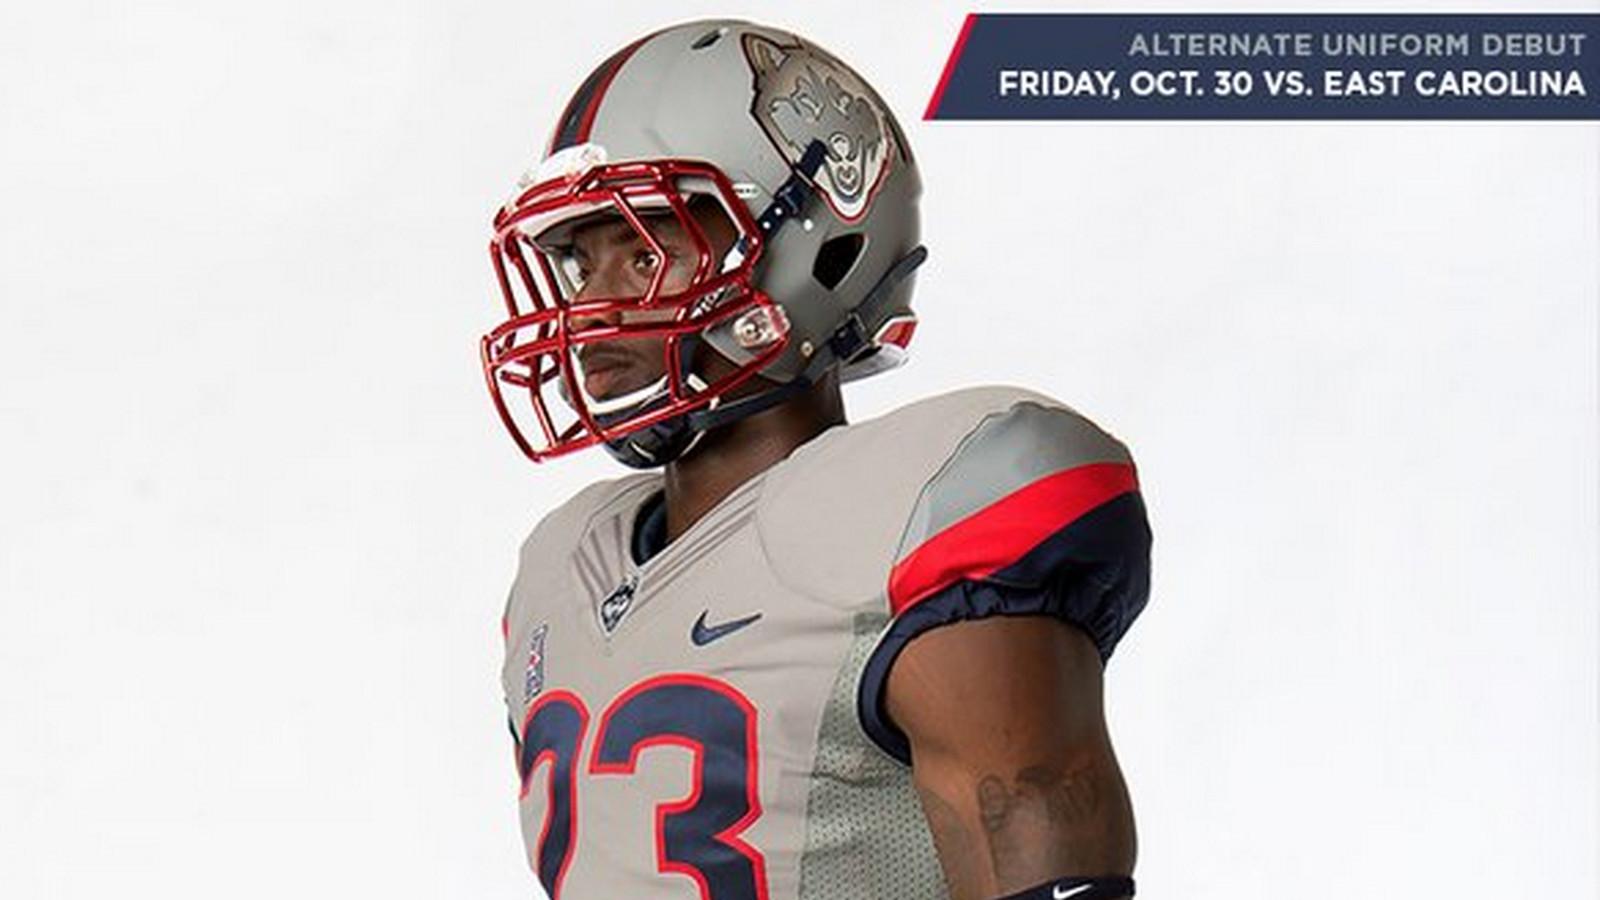 UConn Huskies Football to Wear Alternate Uniforms Against East Carolina -  The UConn Blog 32f4e00bc